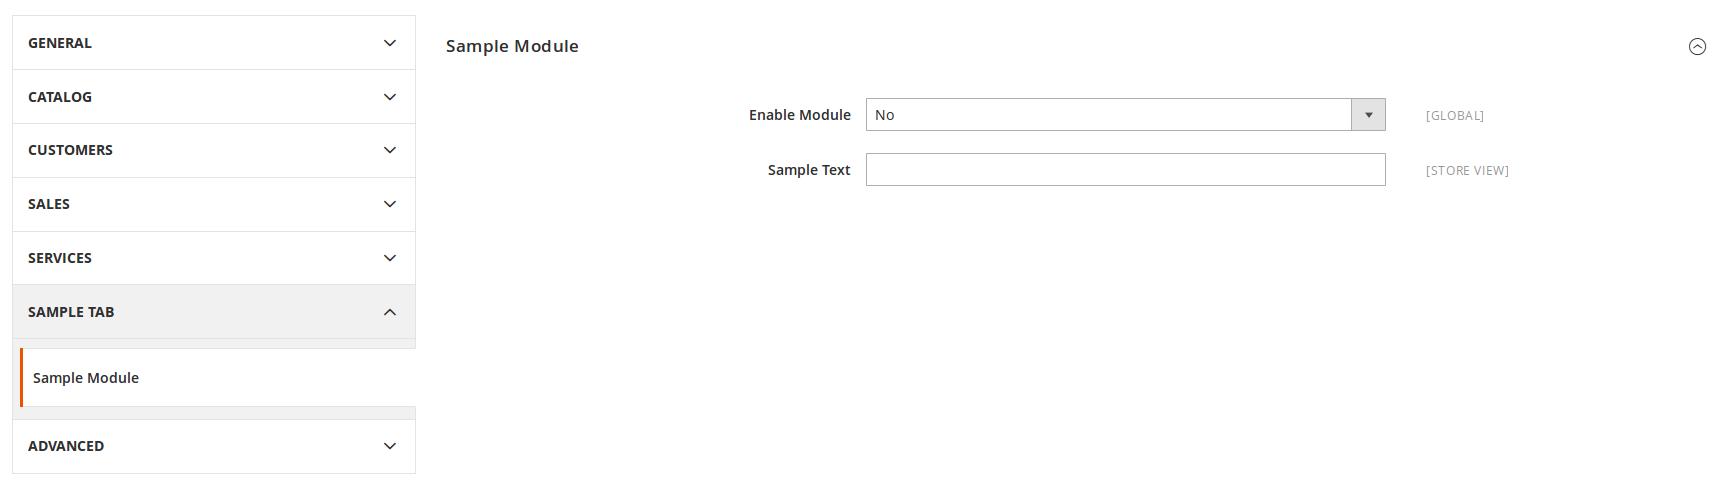 Configuración de Barbanet_SampleModule en Magento2